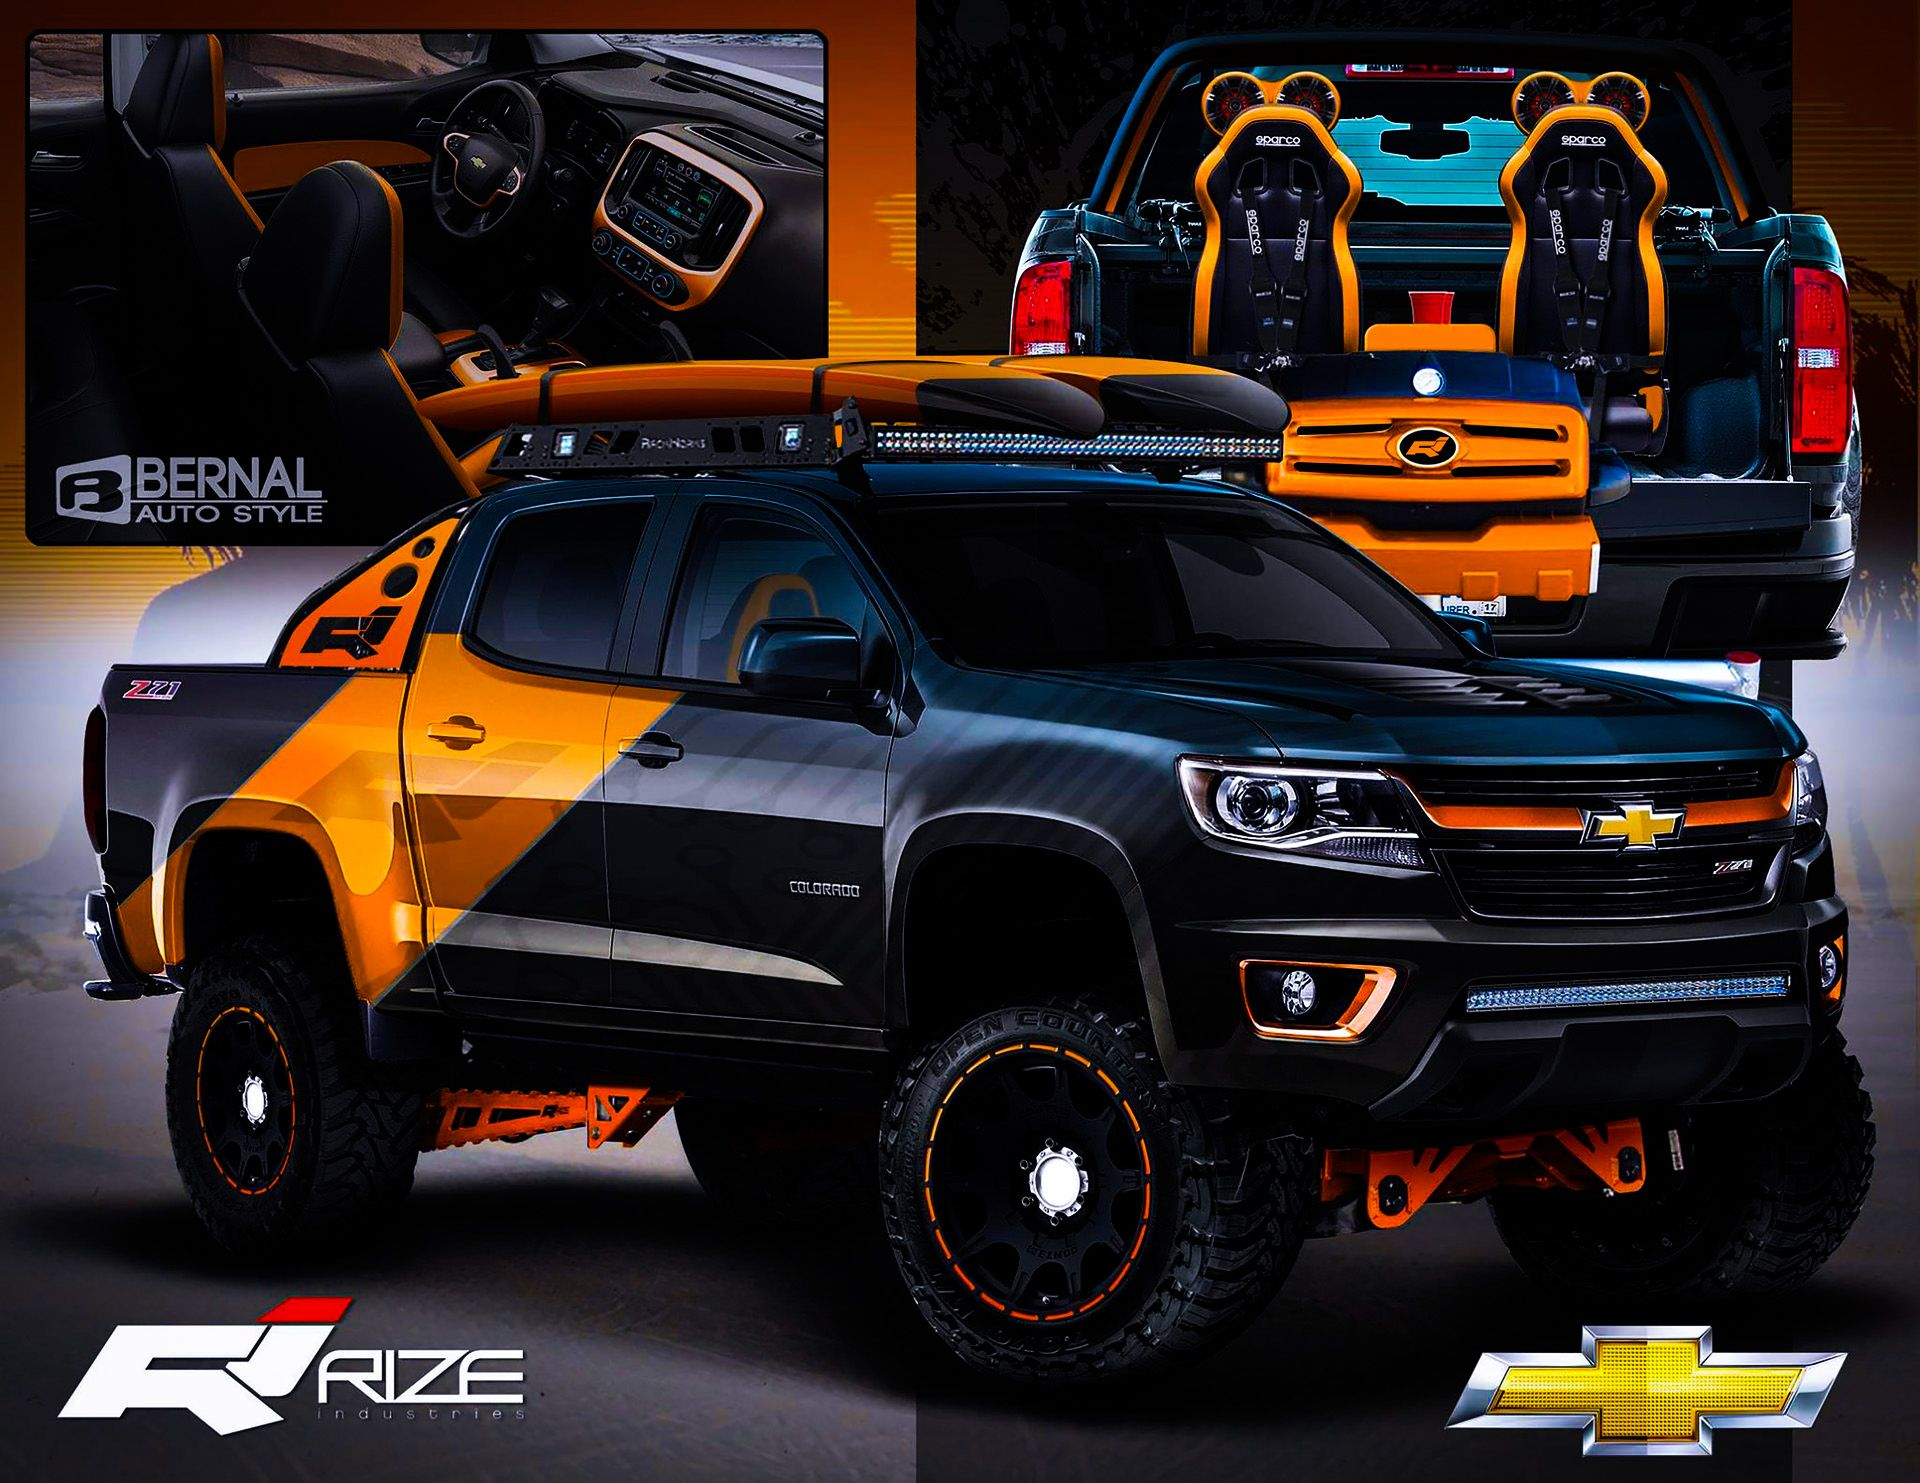 colorado chevy trucks chevrolet lifted graphics vinyl 4x4 gmc canyon mods jeep custom bernal sema proposal rize industries matt truck